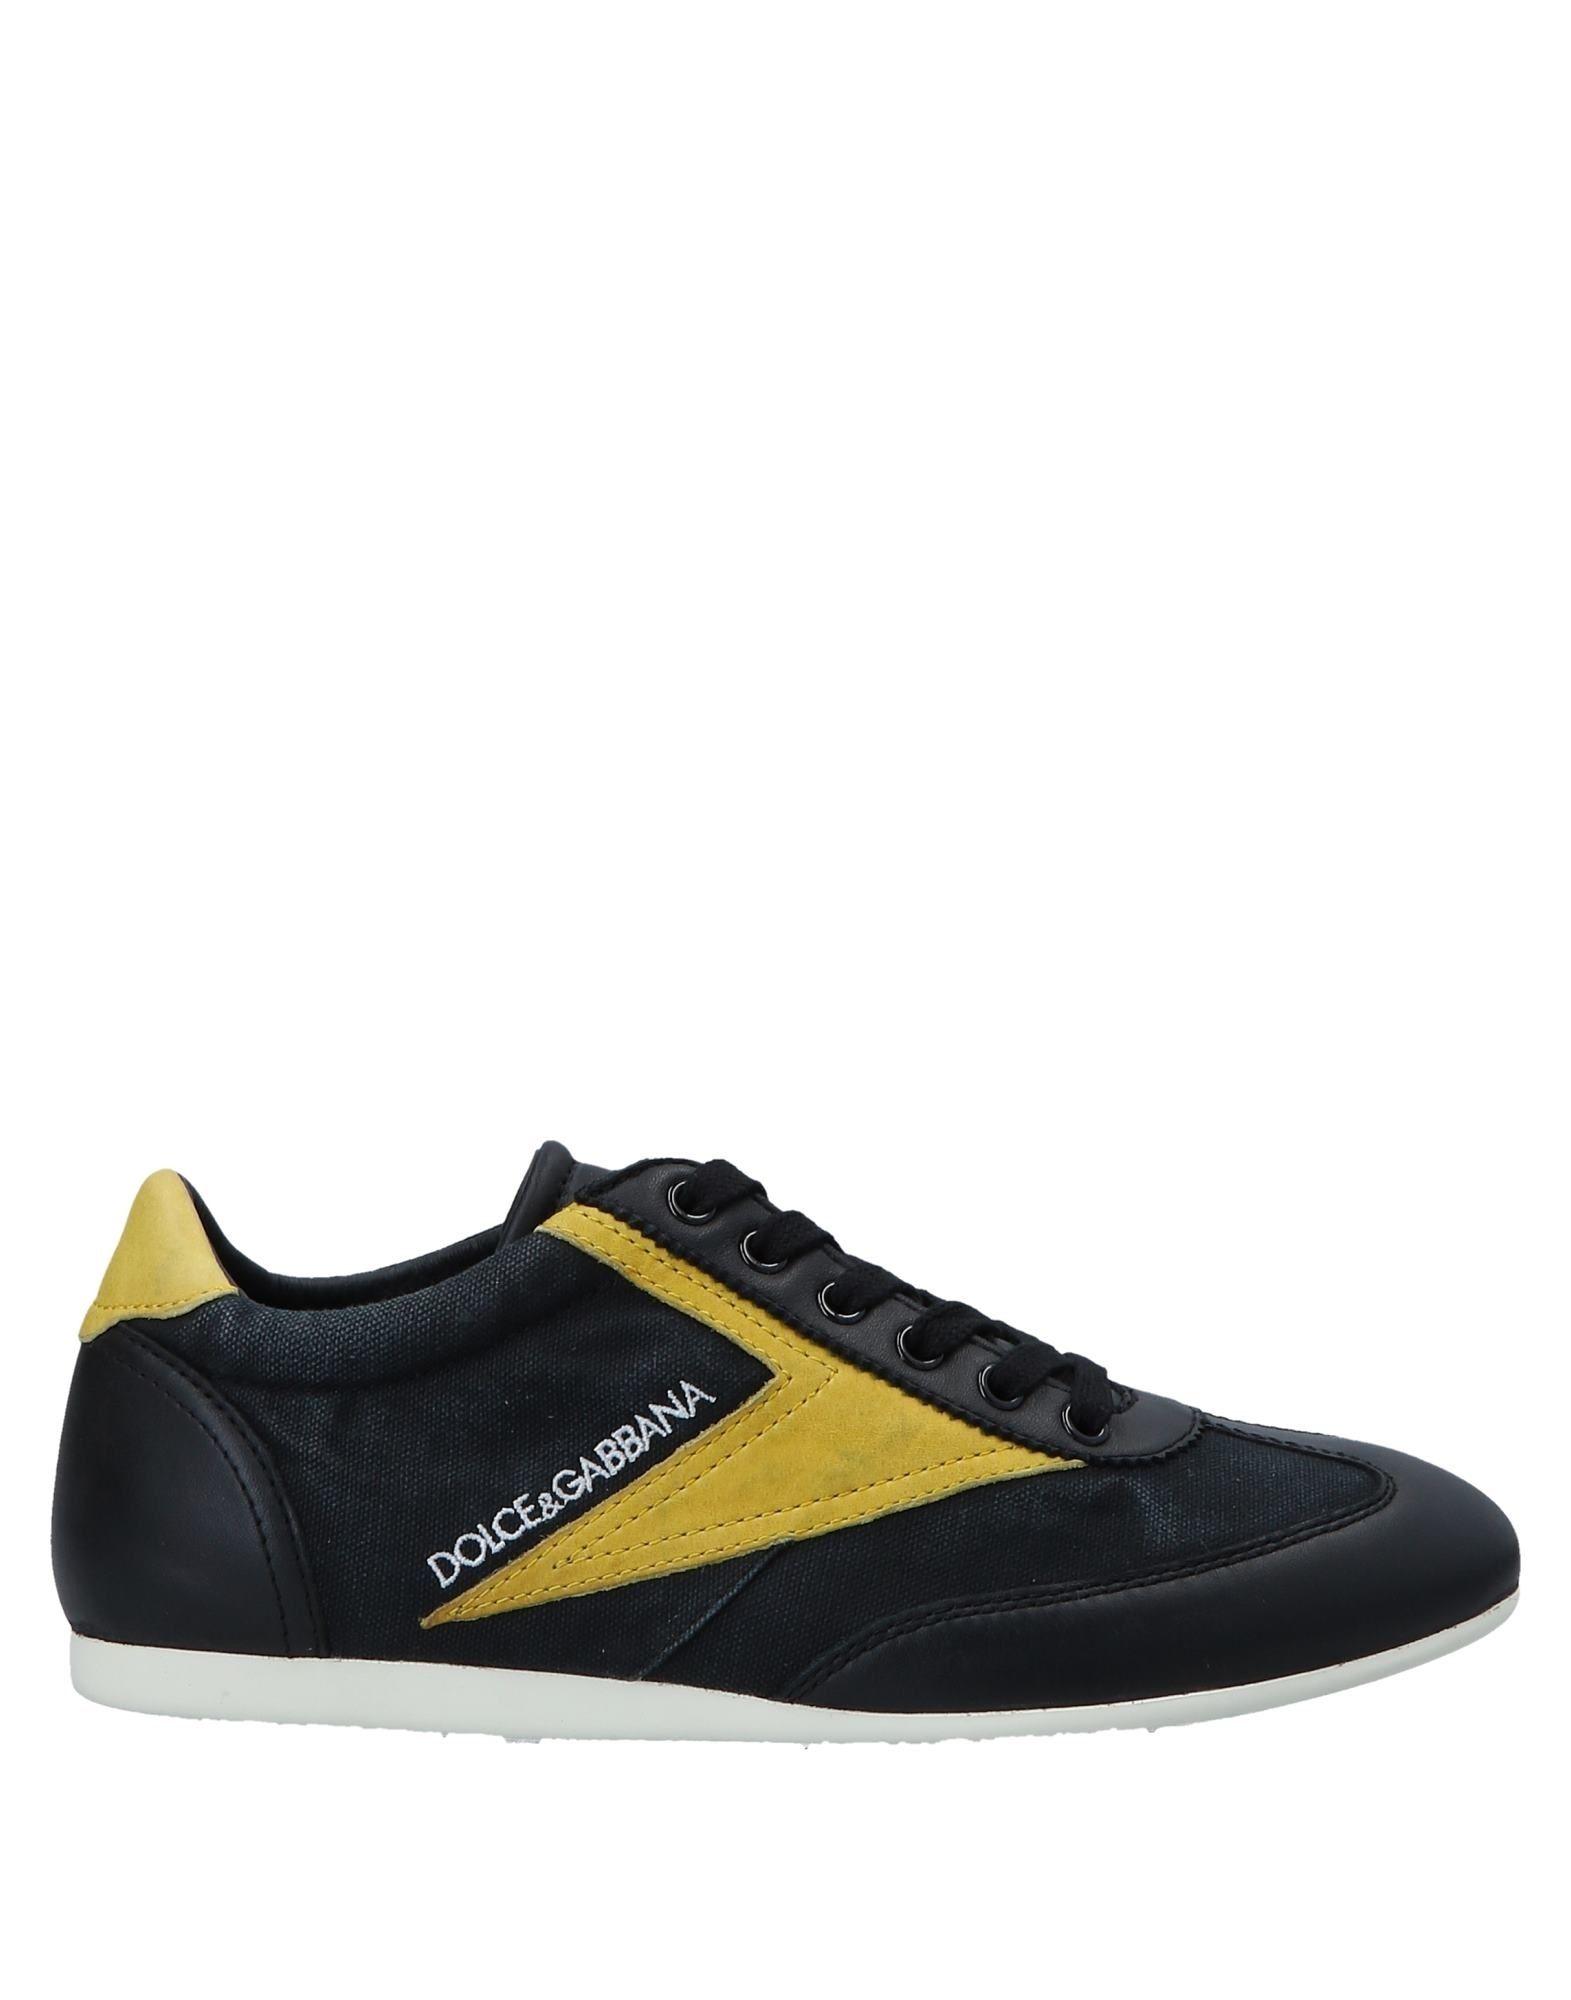 Dolce & Gabbana Sneakers Herren  11549878DU Gute Qualität beliebte Schuhe